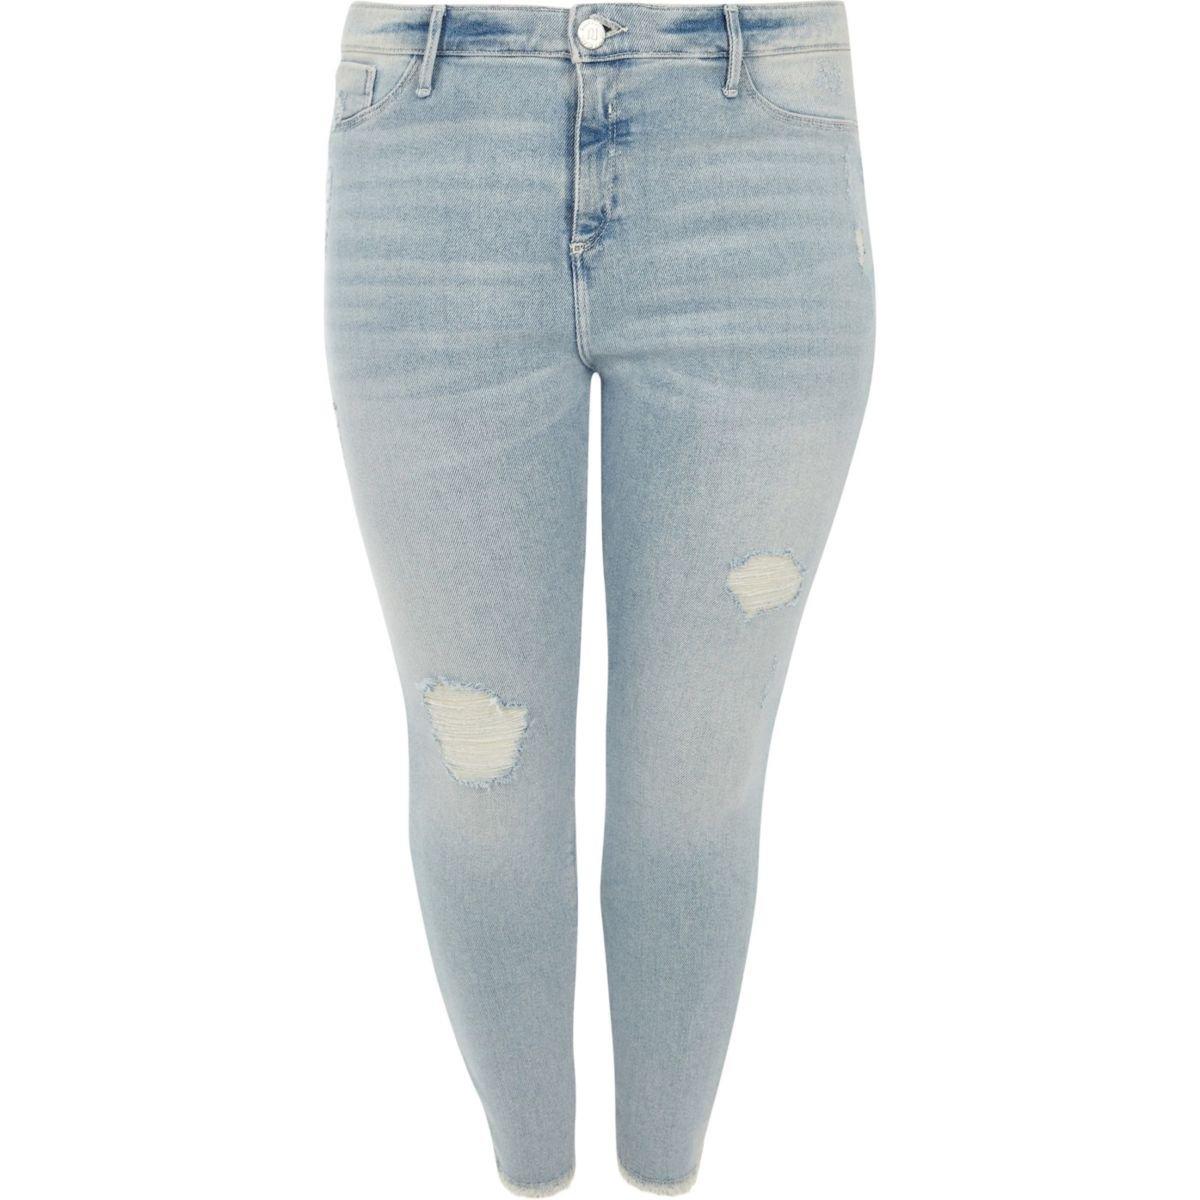 Plus light blue Molly skinny ripped jeggings - Jeggings - Jeans - women